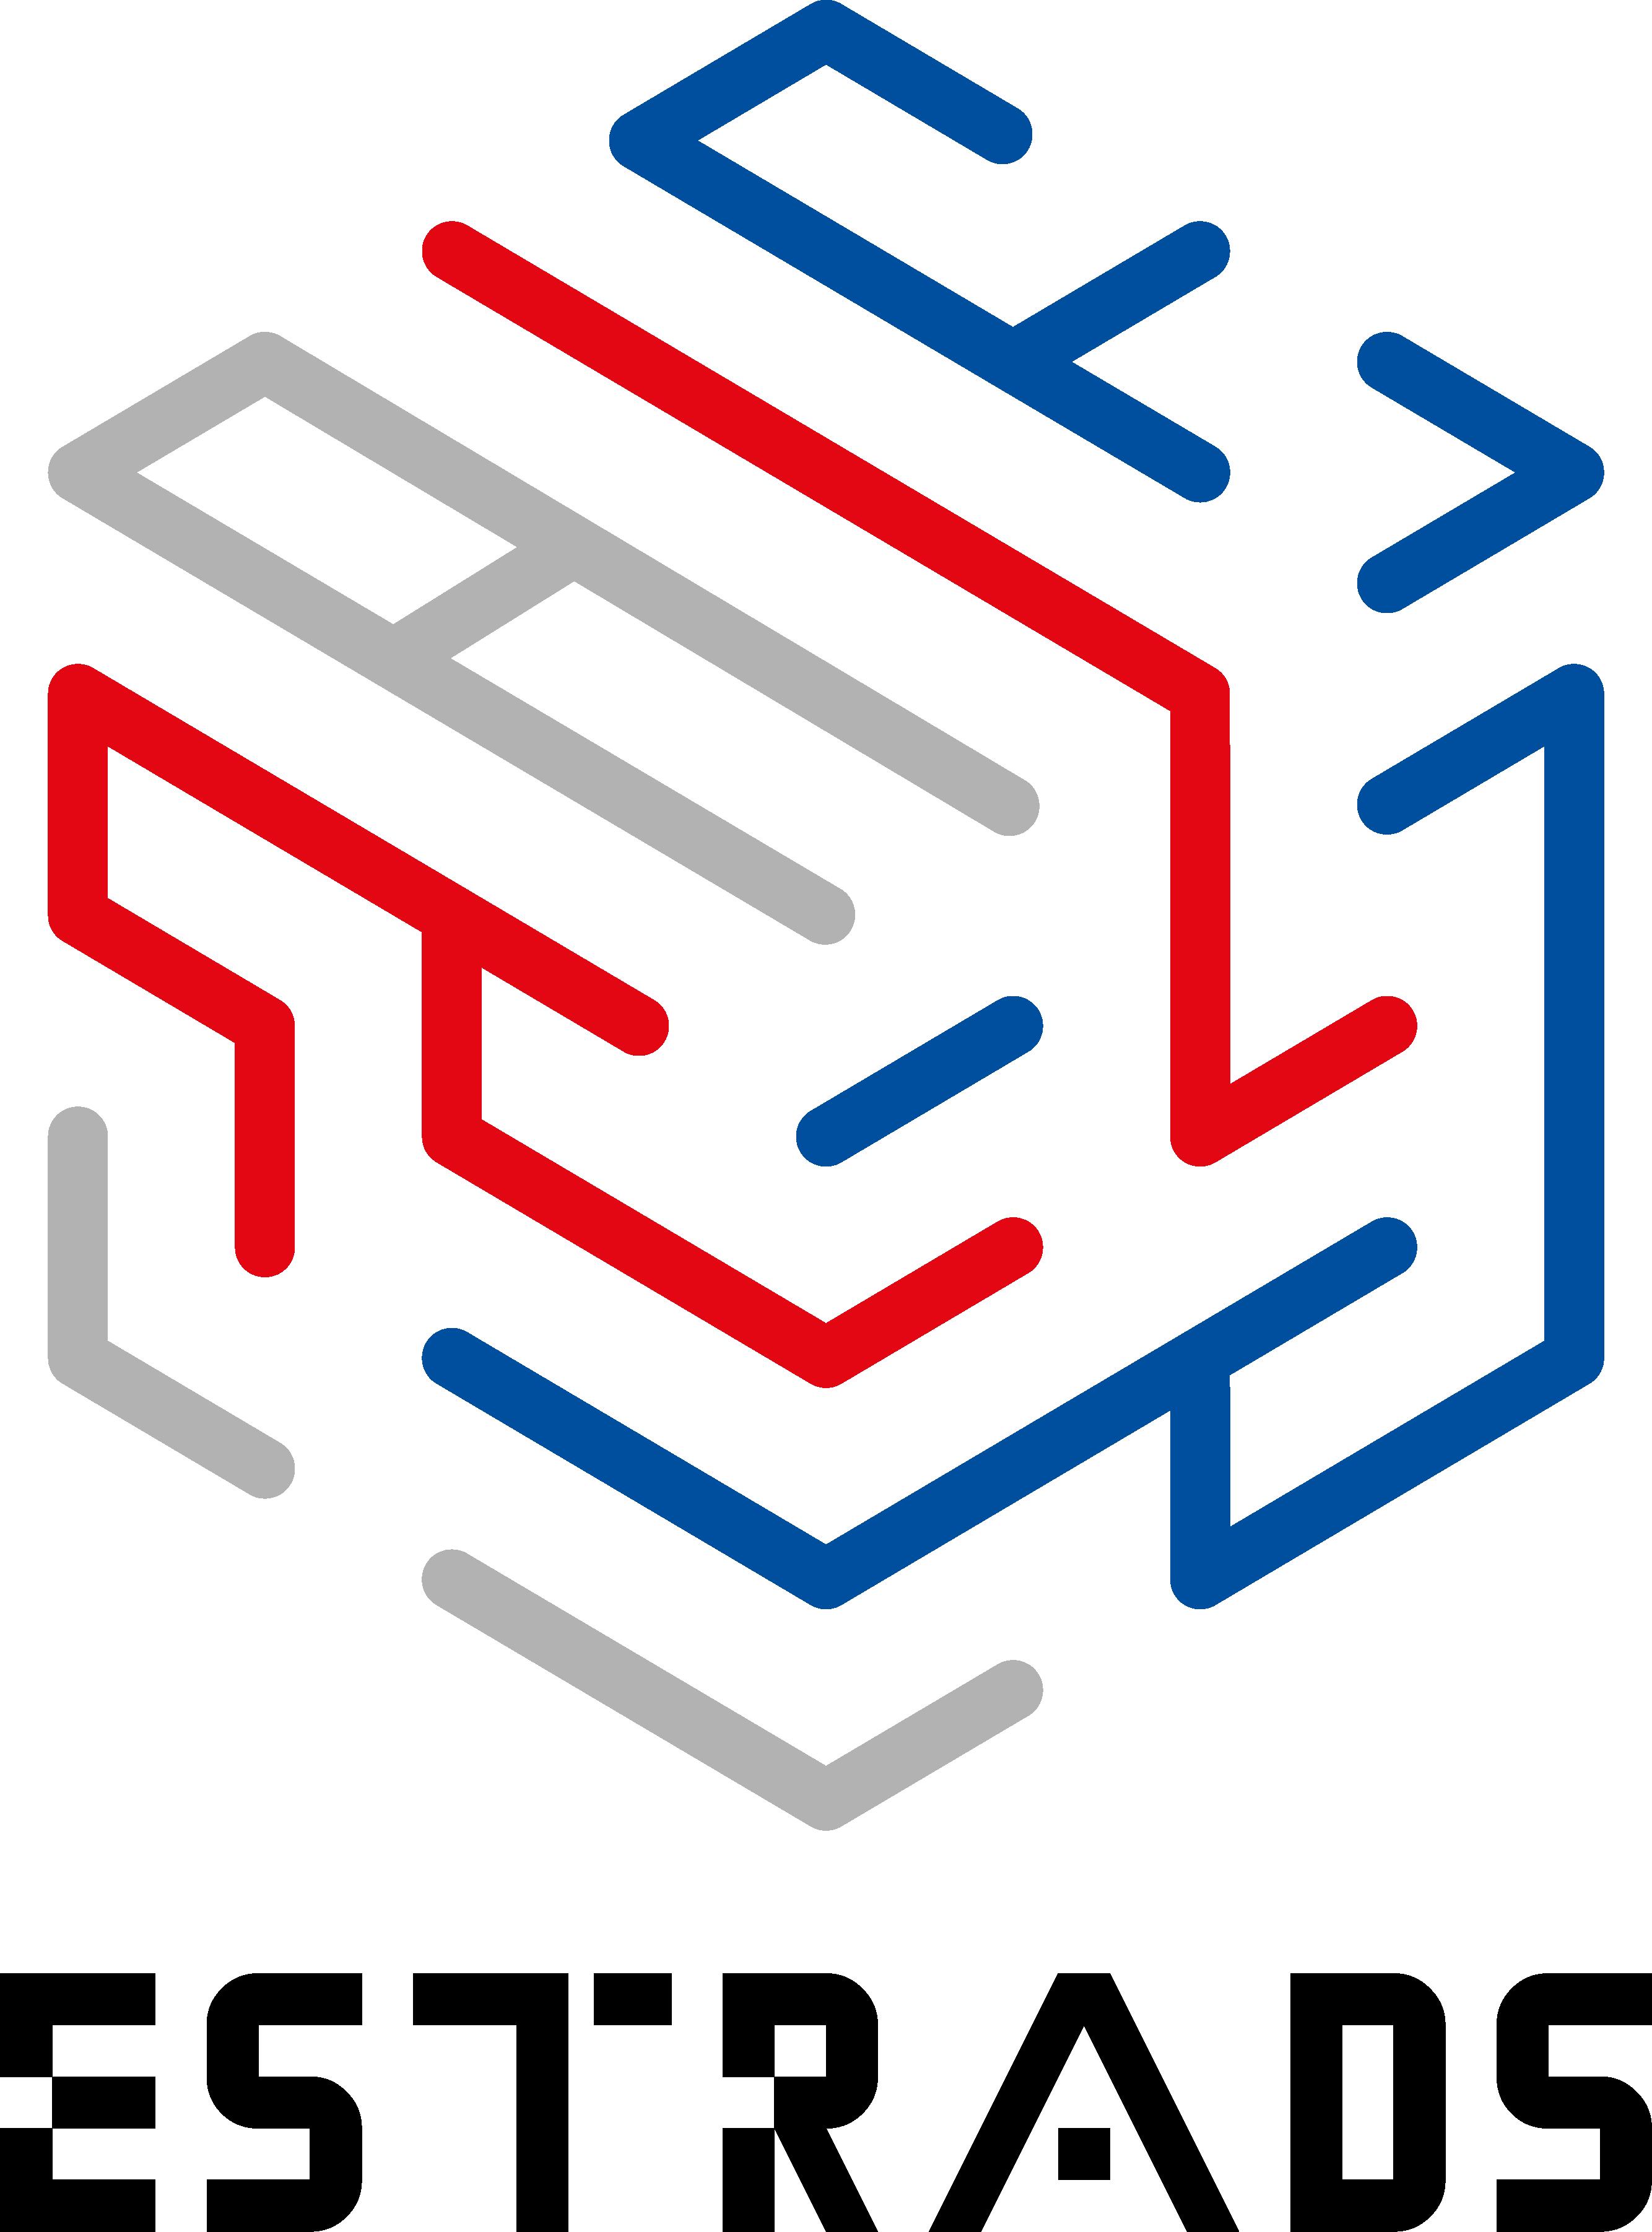 Logo ESTRADS